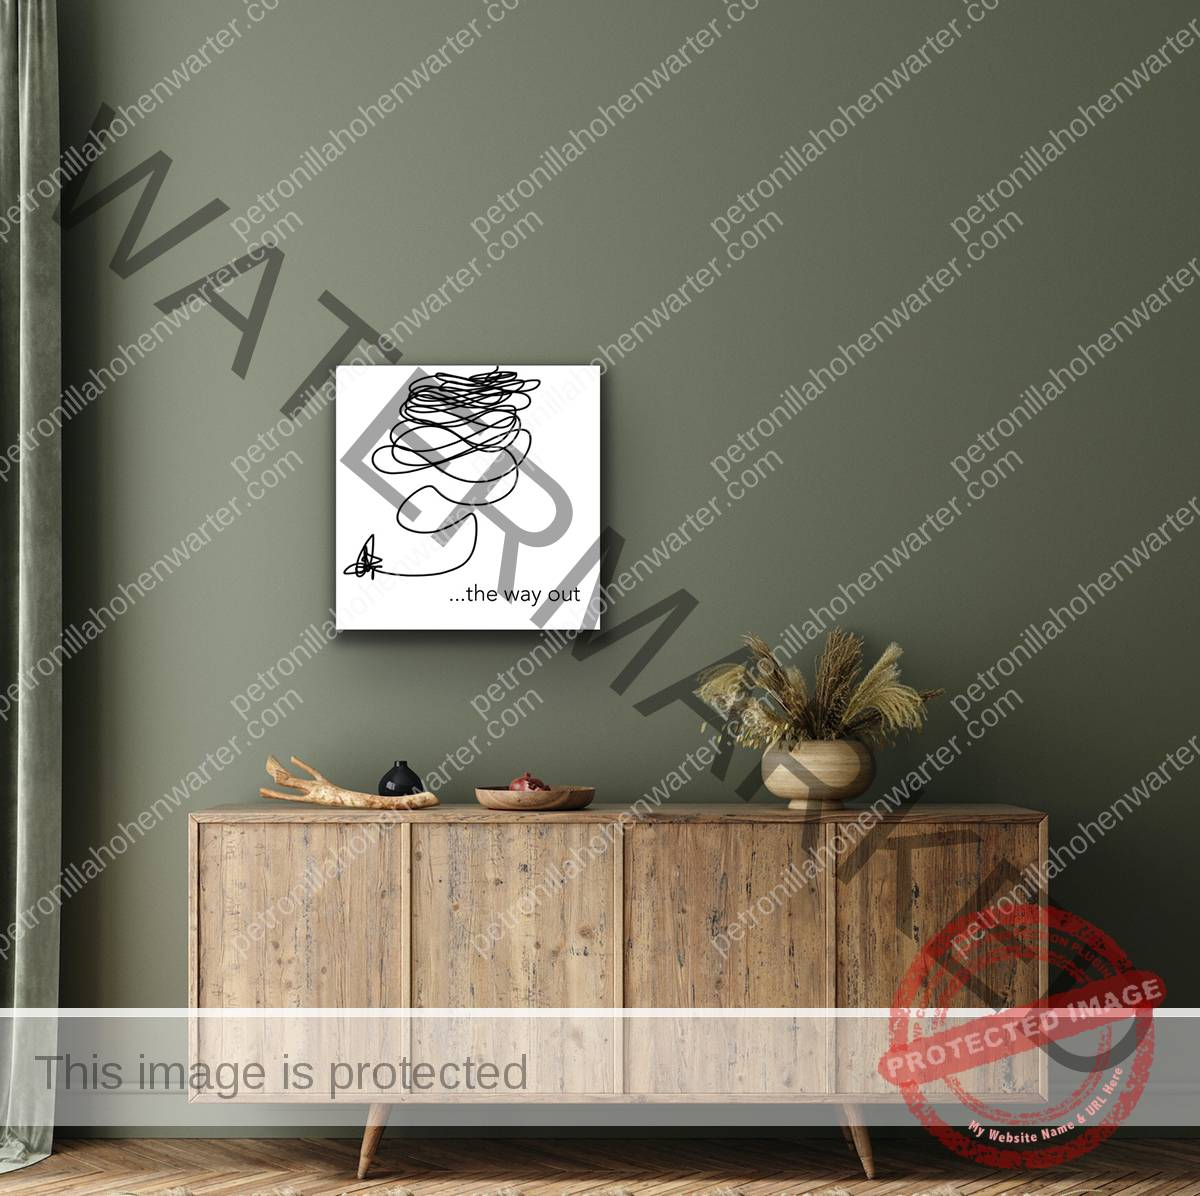 the essentials affordable art kunst wohnen art interior digital print acrylglas print petronilla hohenwarter